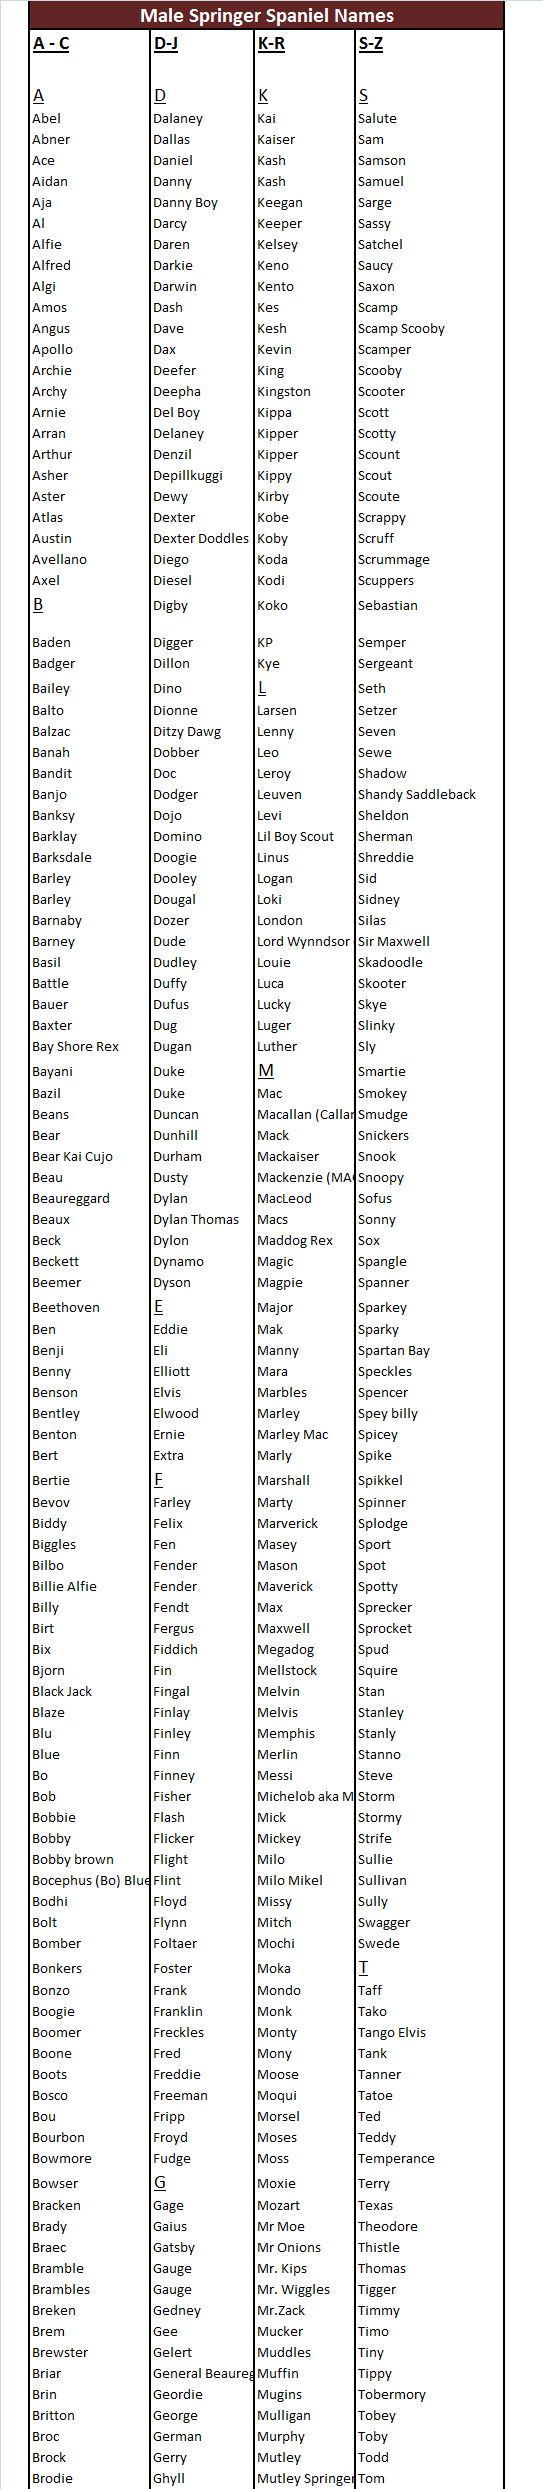 Male Springer Names Names Male Words